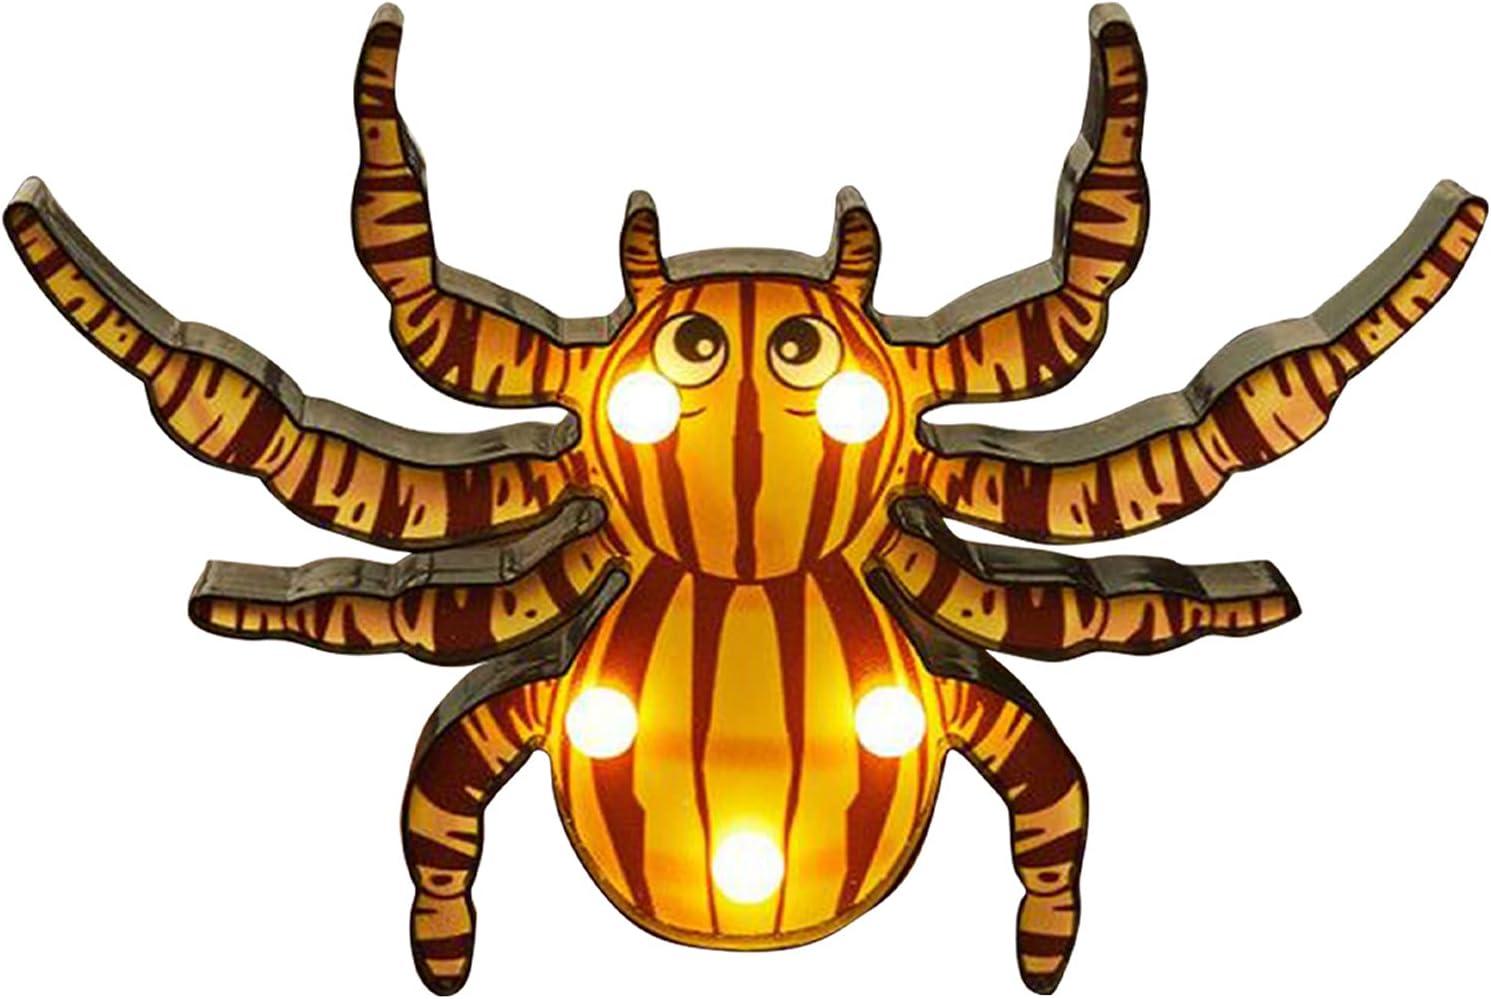 Halloween Luminous List Max 79% OFF price Modeling lamp Pumpkin Ornaments Lantern Skull